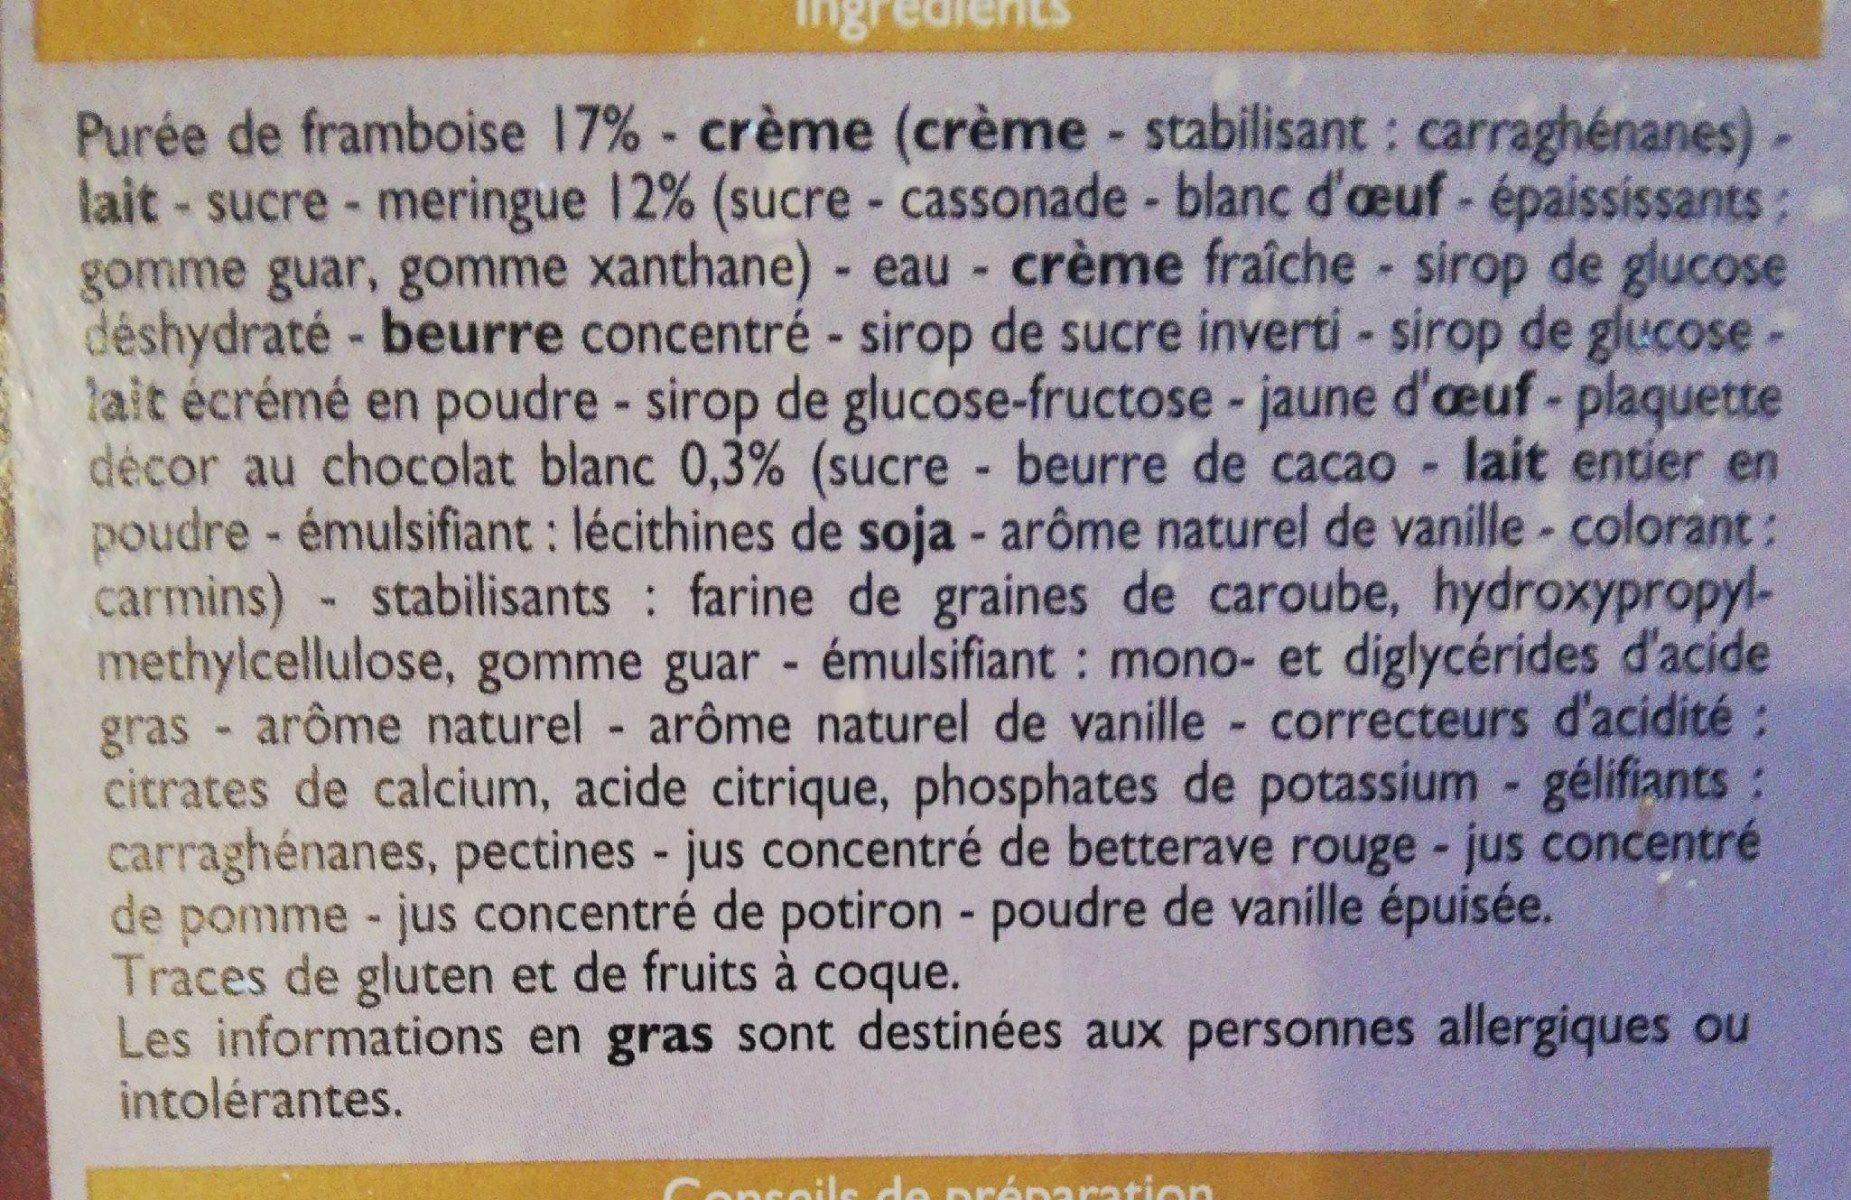 Bûche glacée façon vacherin - Ingredients - fr